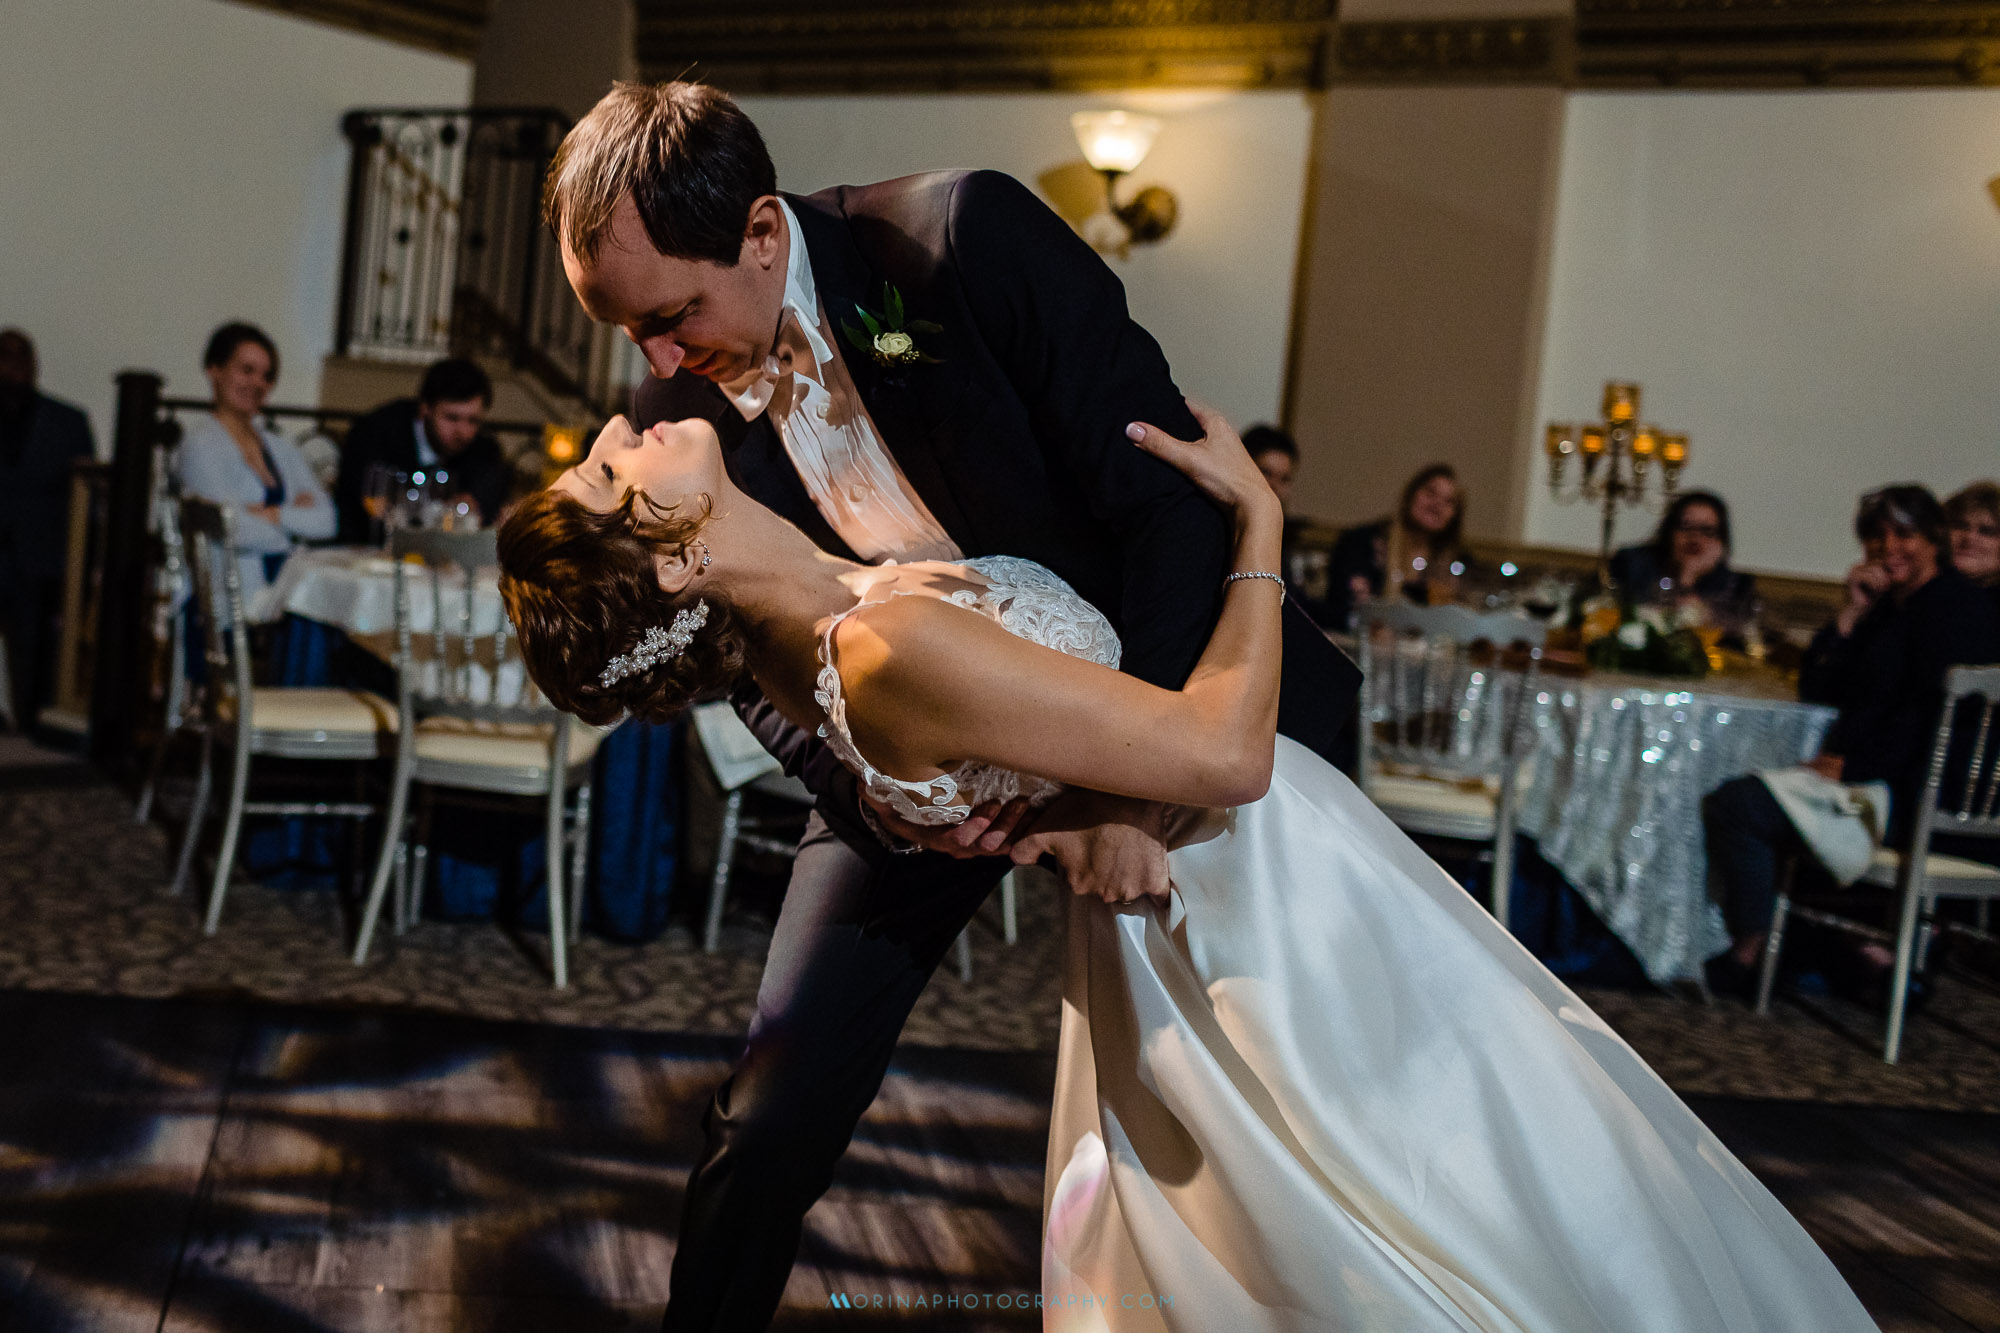 Ilhana & Jonathan Wedding at Vault 634 - Allentown 0061.jpg